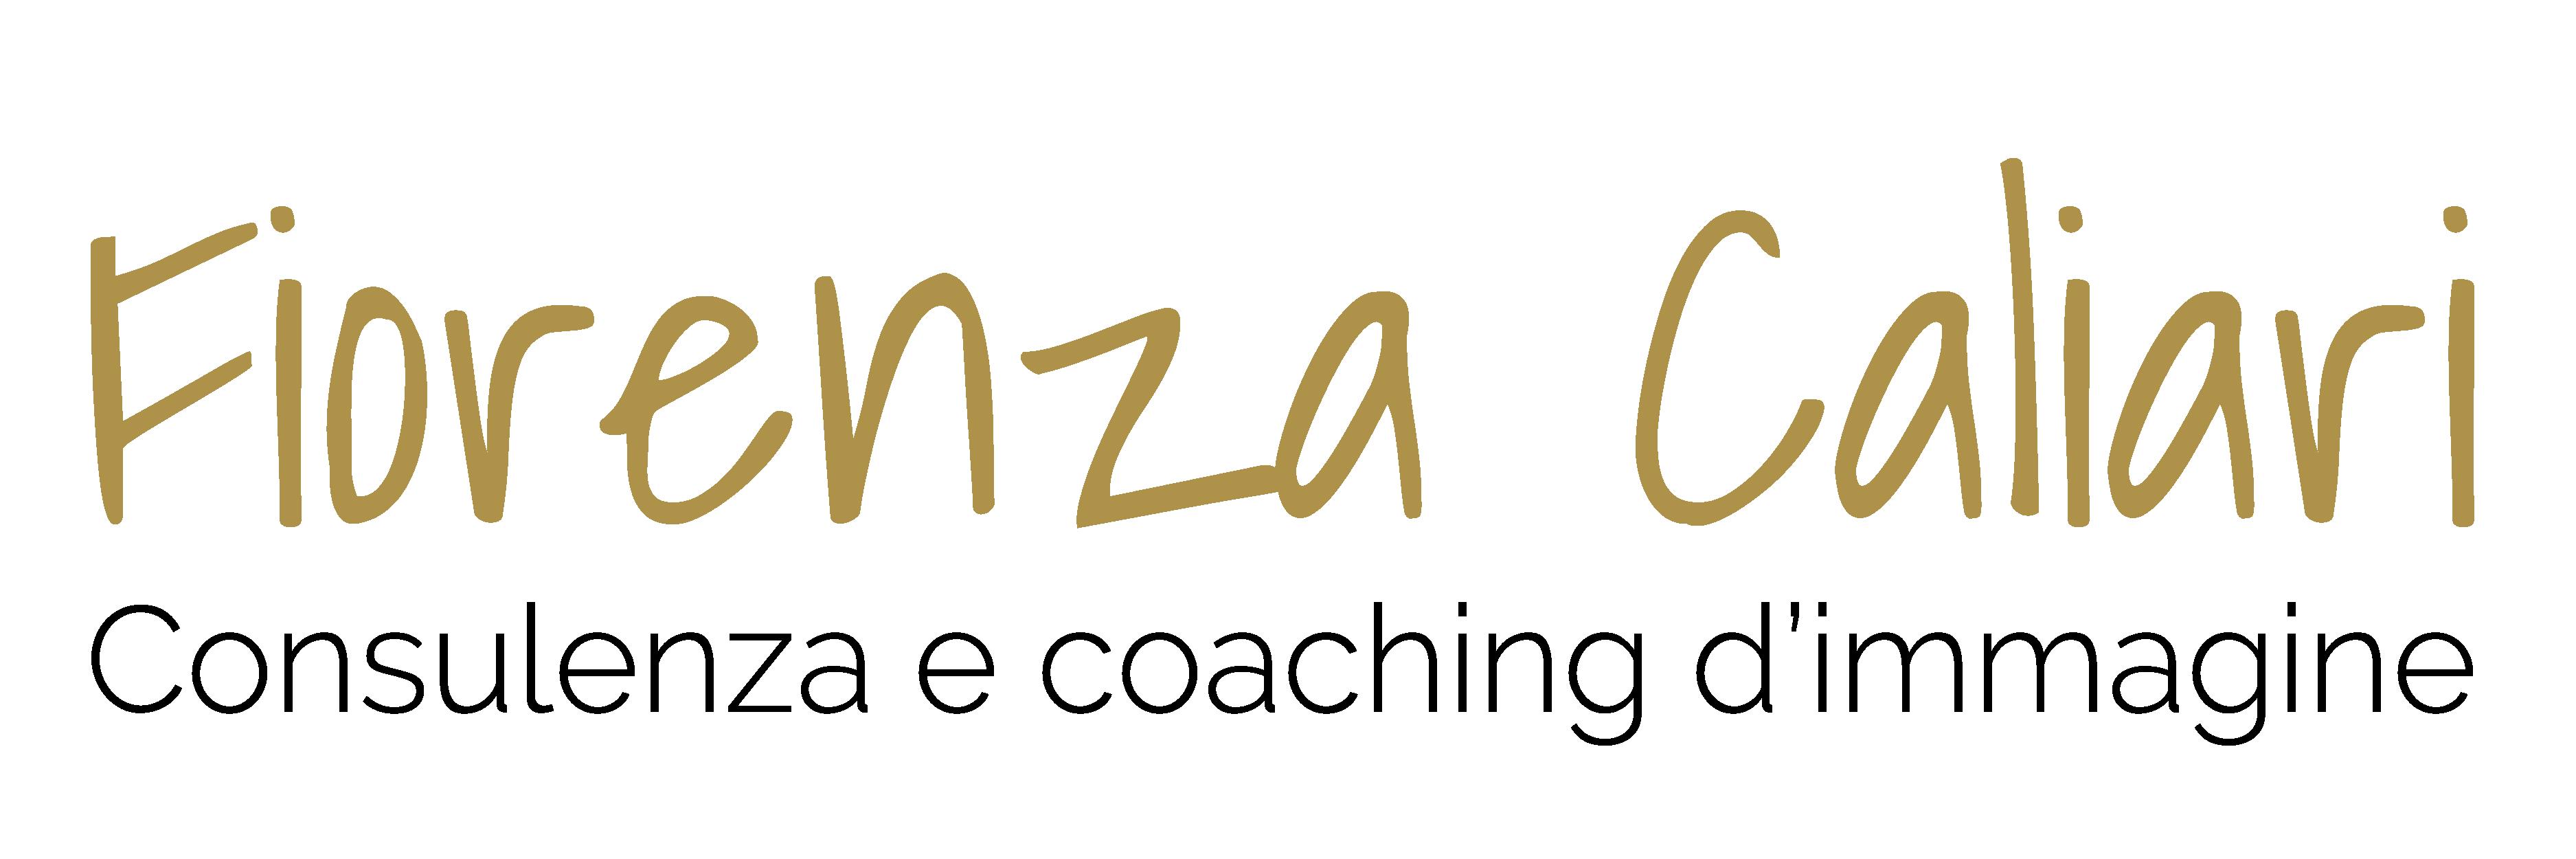 Fiorenza Caliari - Consulenze d'immagine - Trento